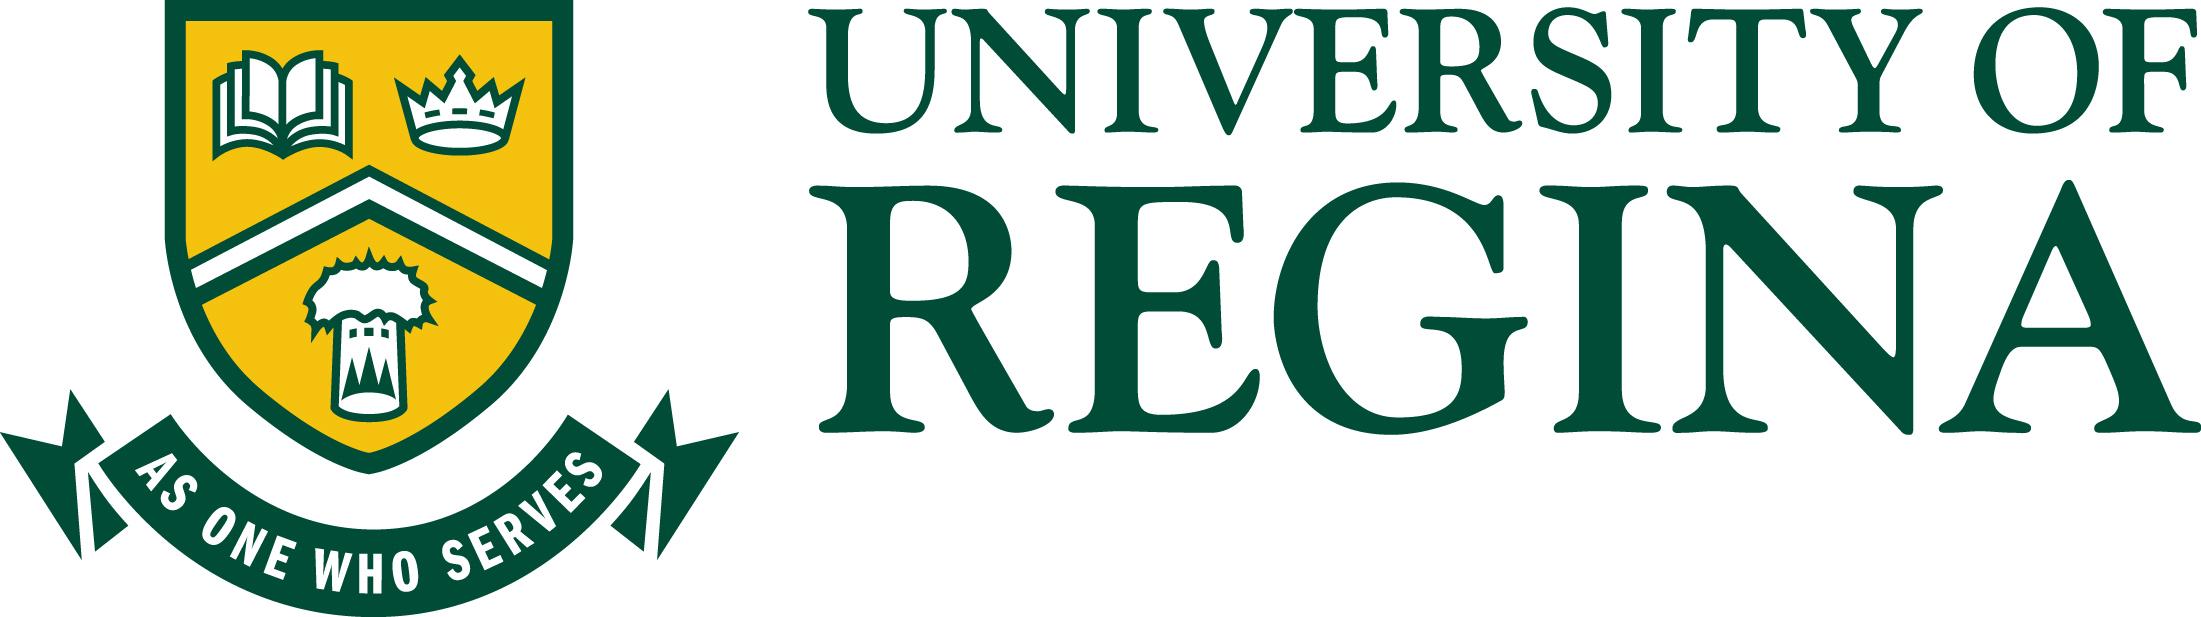 UofR_Logo-1.jpg